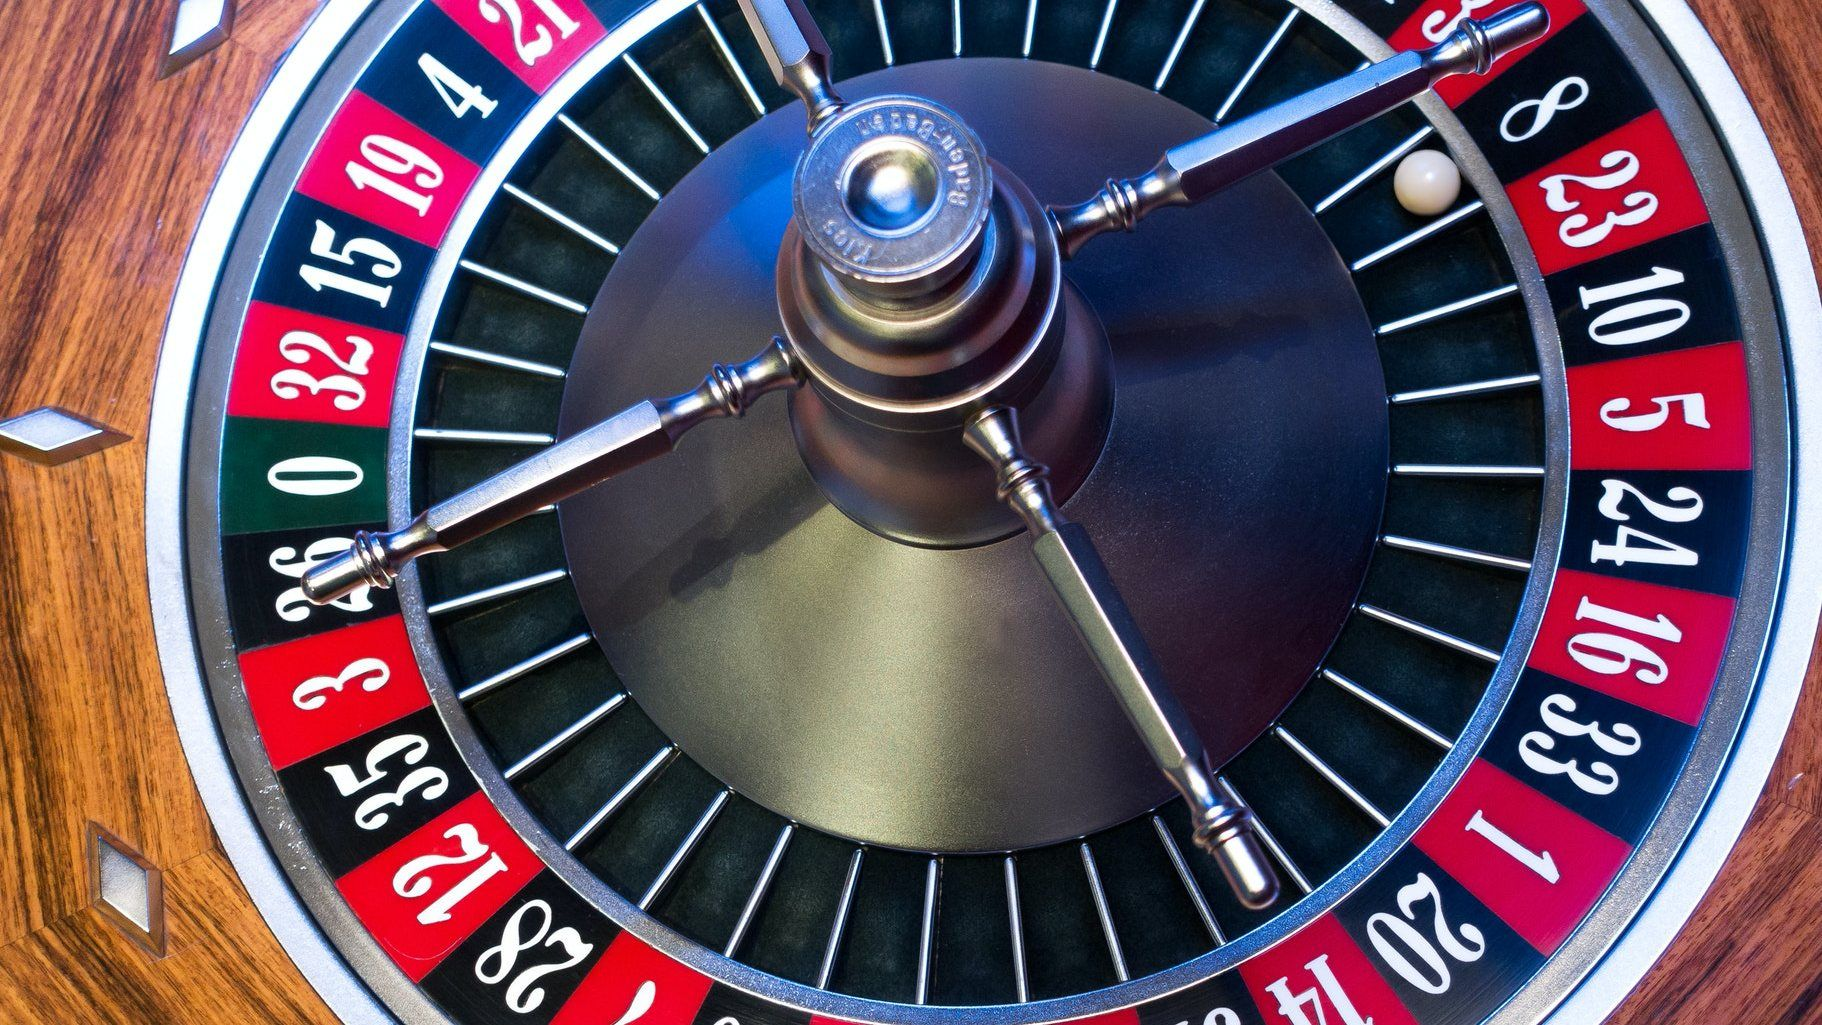 re:Invent Roulette